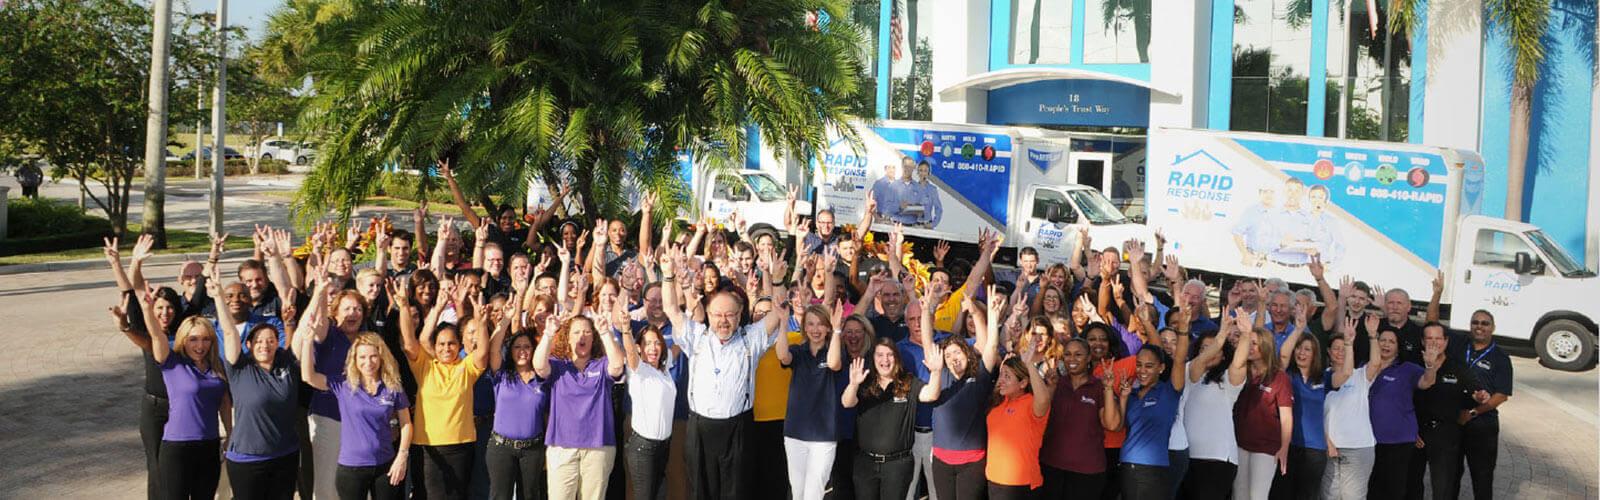 people's-trust-in-the-florida-community-min-(1)60ab41f5b33960c09c22ff010053f581